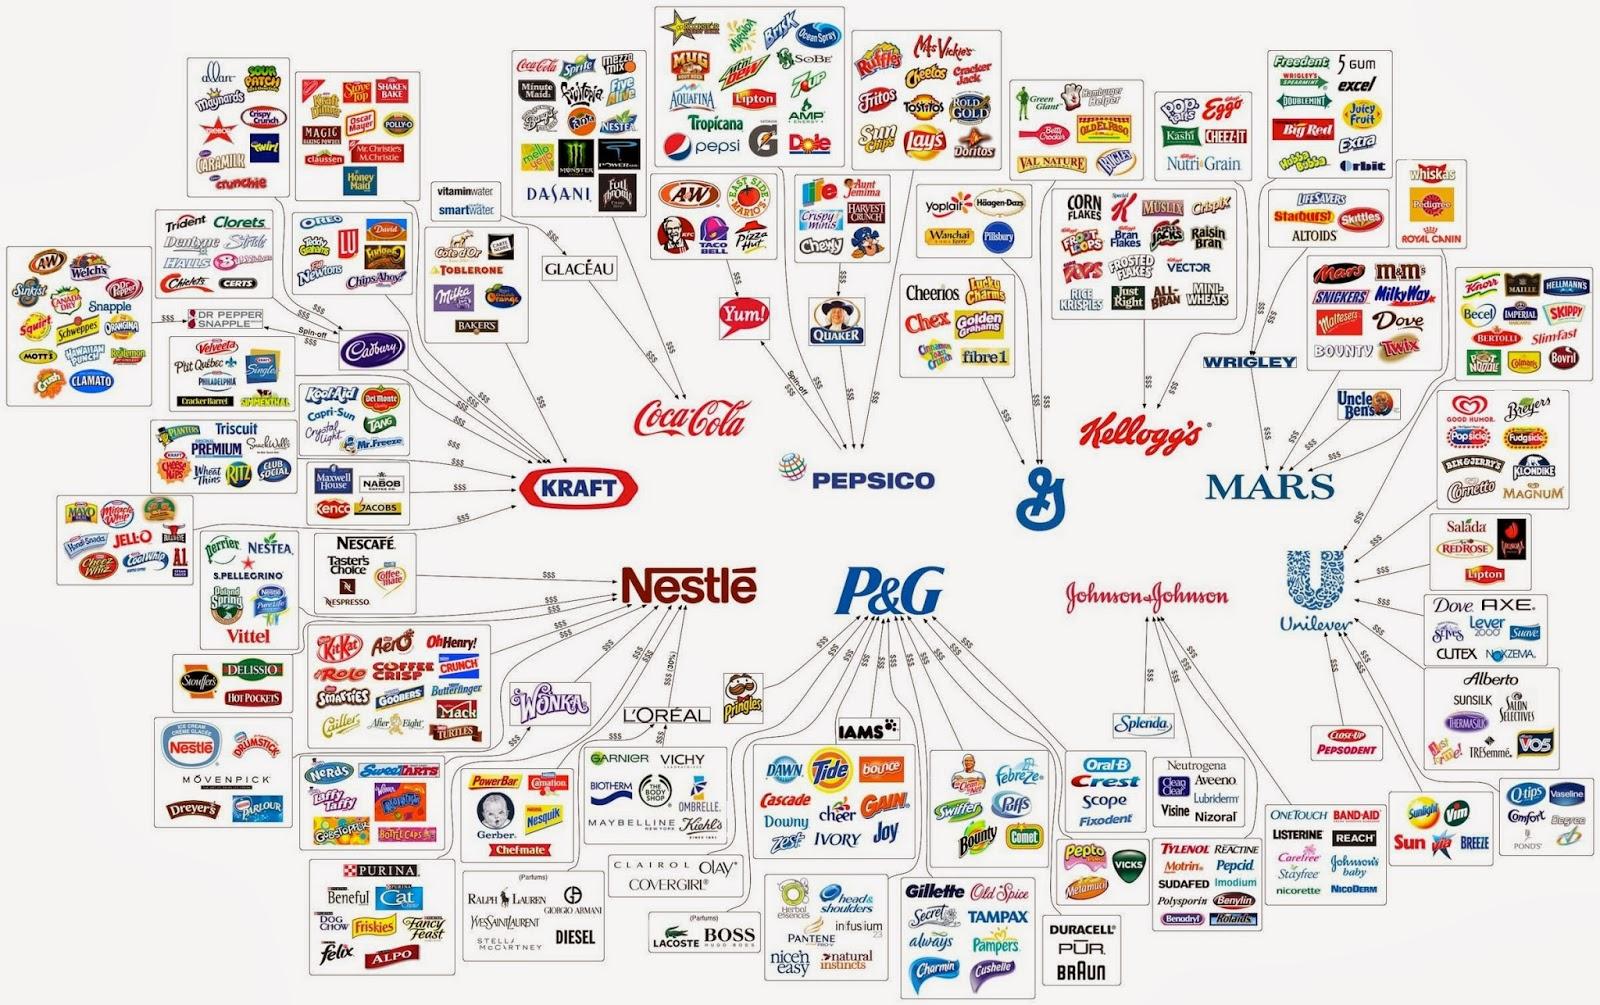 http://uk.businessinsider.com/10-companies-control-food-industry-2017-3/?r=AU&IR=T